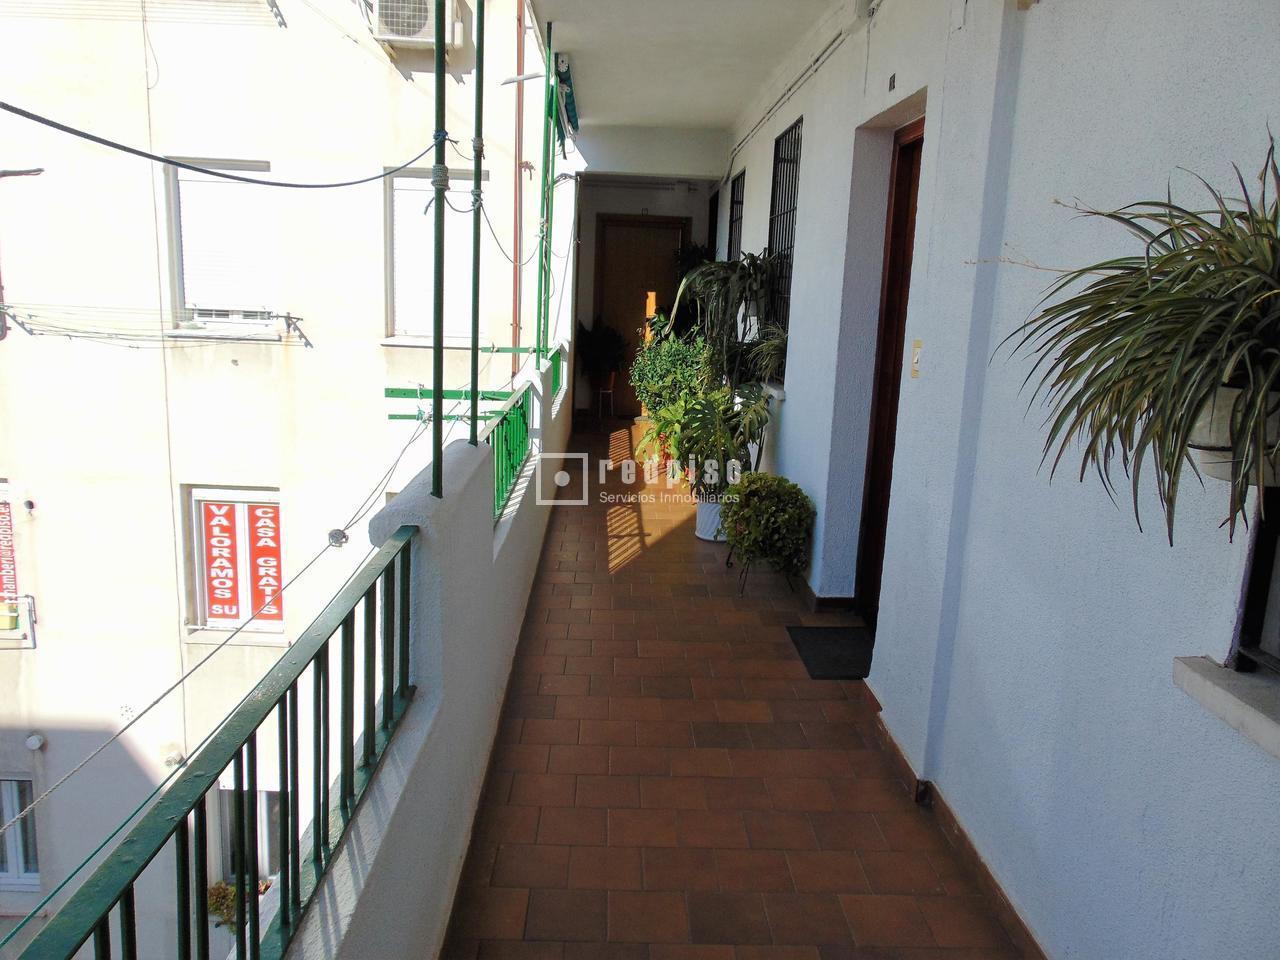 Piso en alquiler en calle donoso cortes chamber madrid for Alquiler pisos madrid chamberi